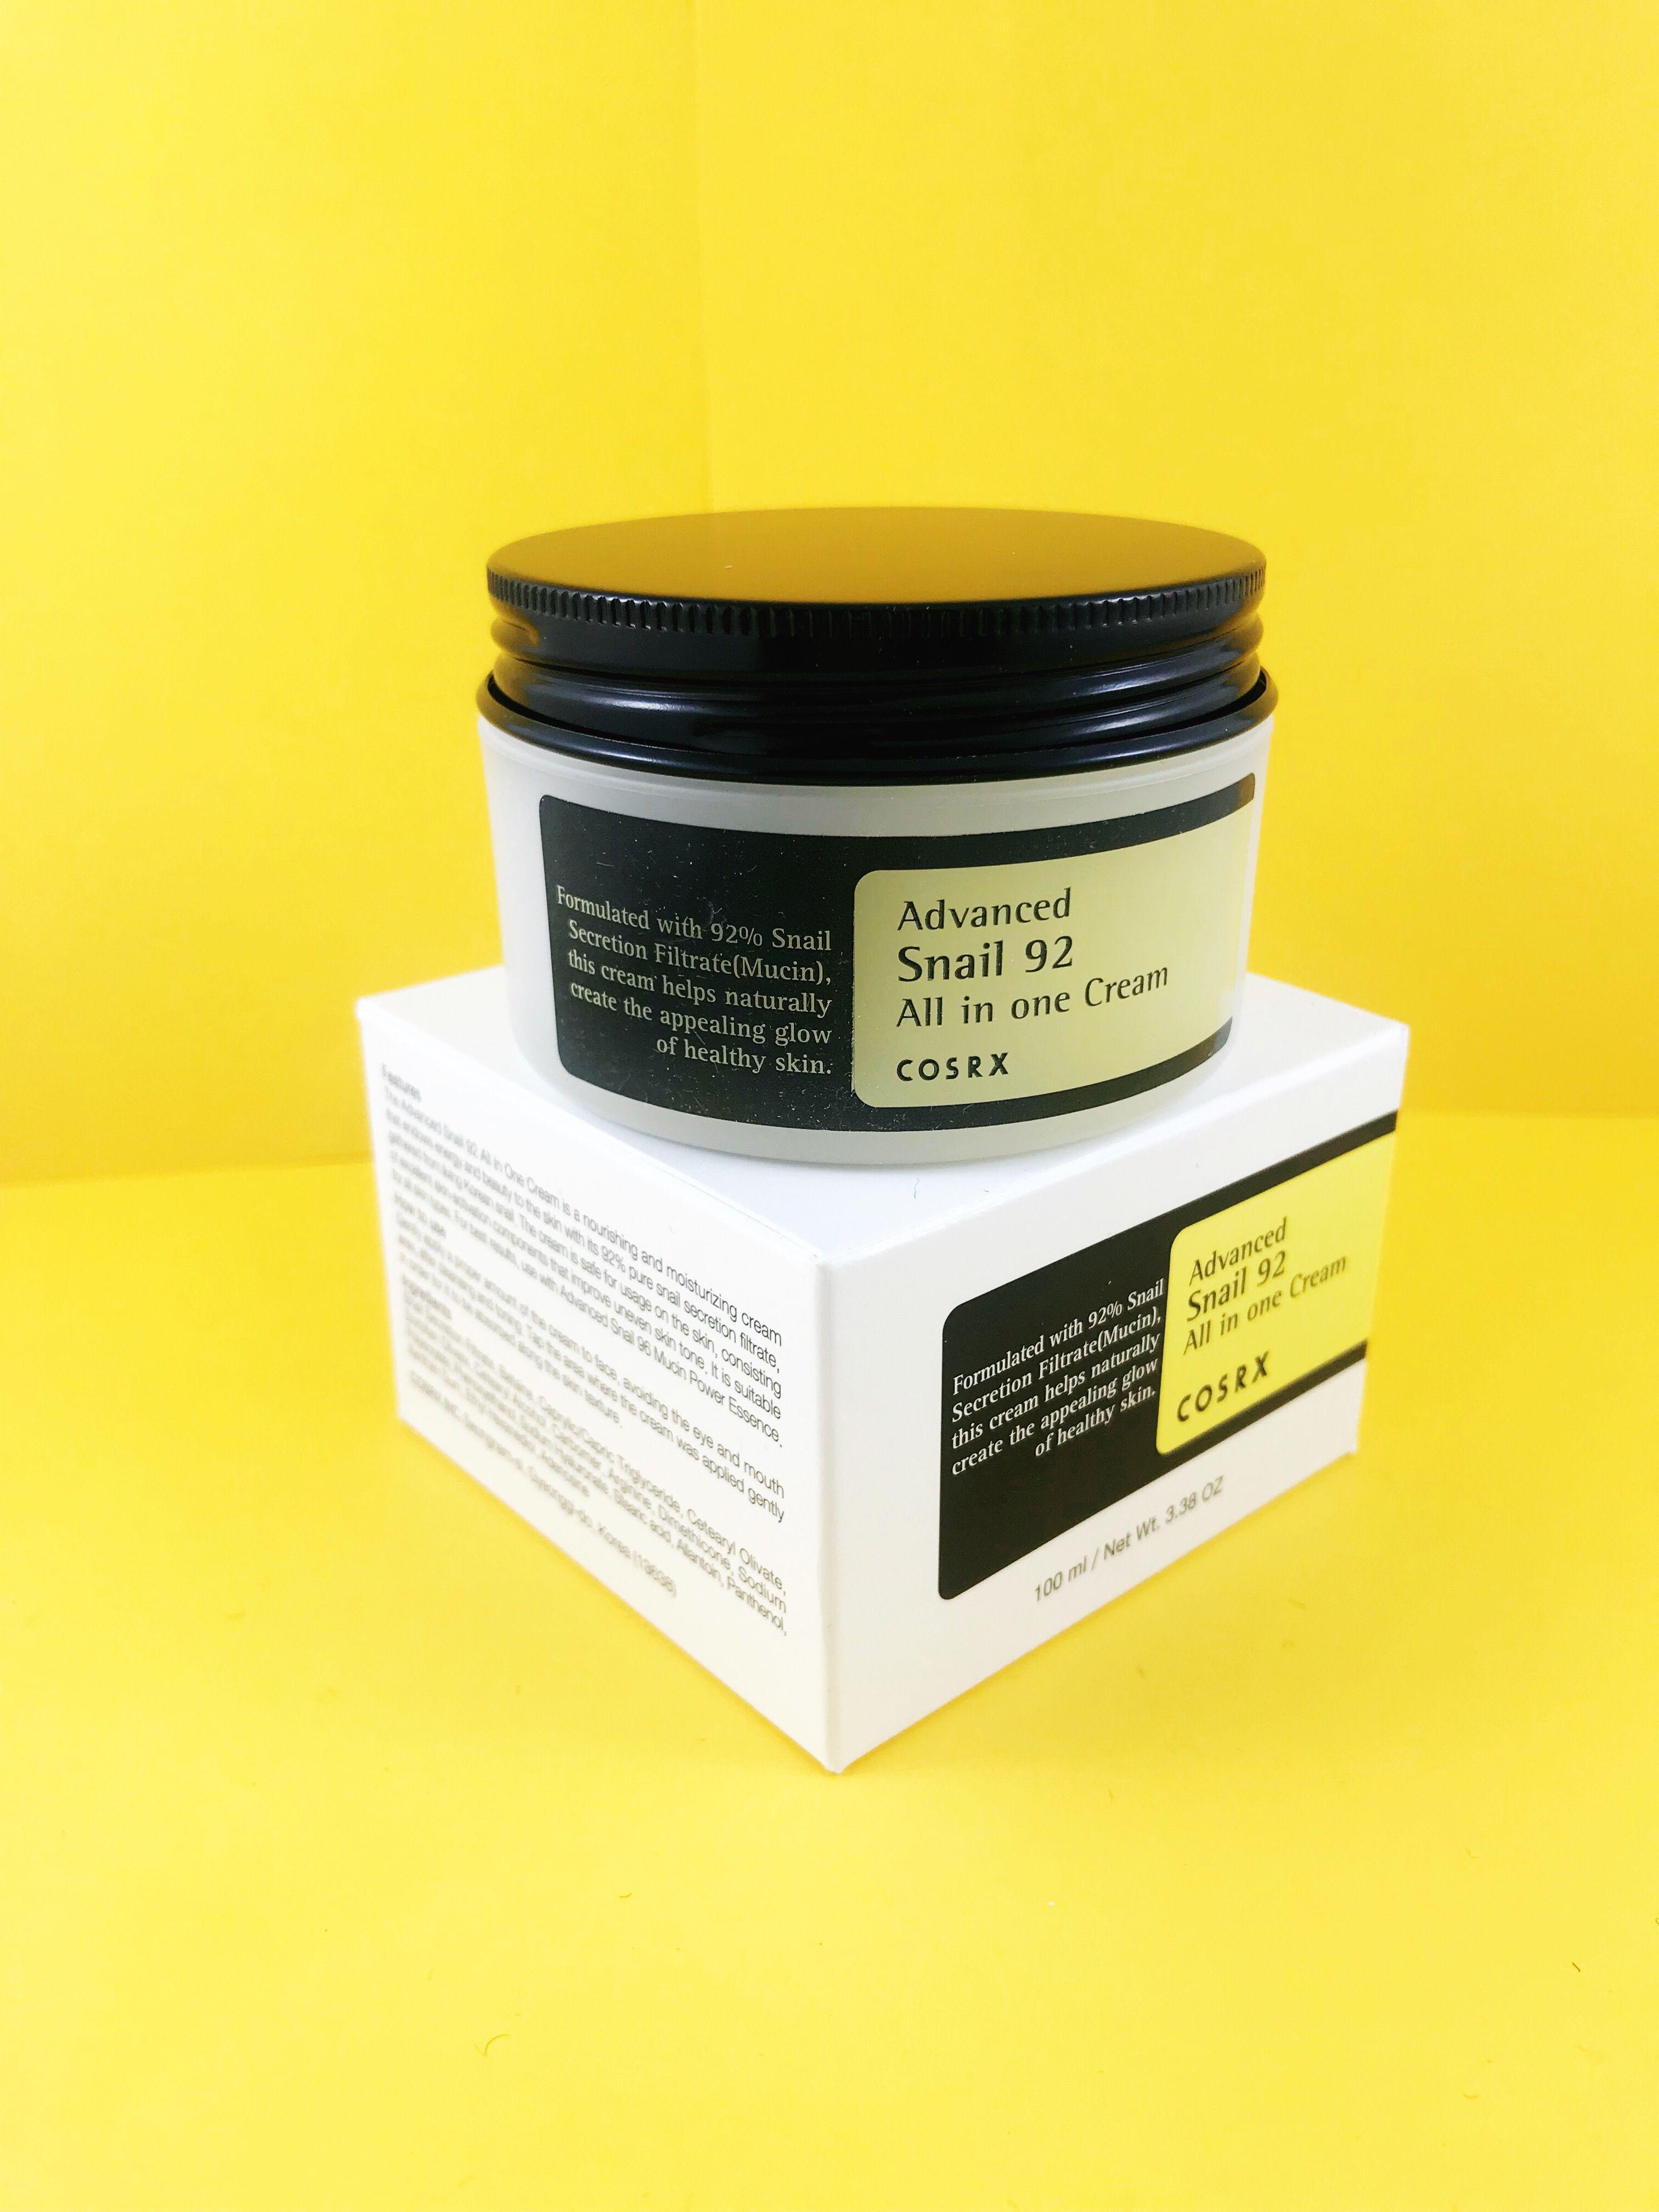 Cosrx Advanced Snail 92 All In One Cream Korean Skincare Secretion Filtrate Moisture Facial 30 Ml